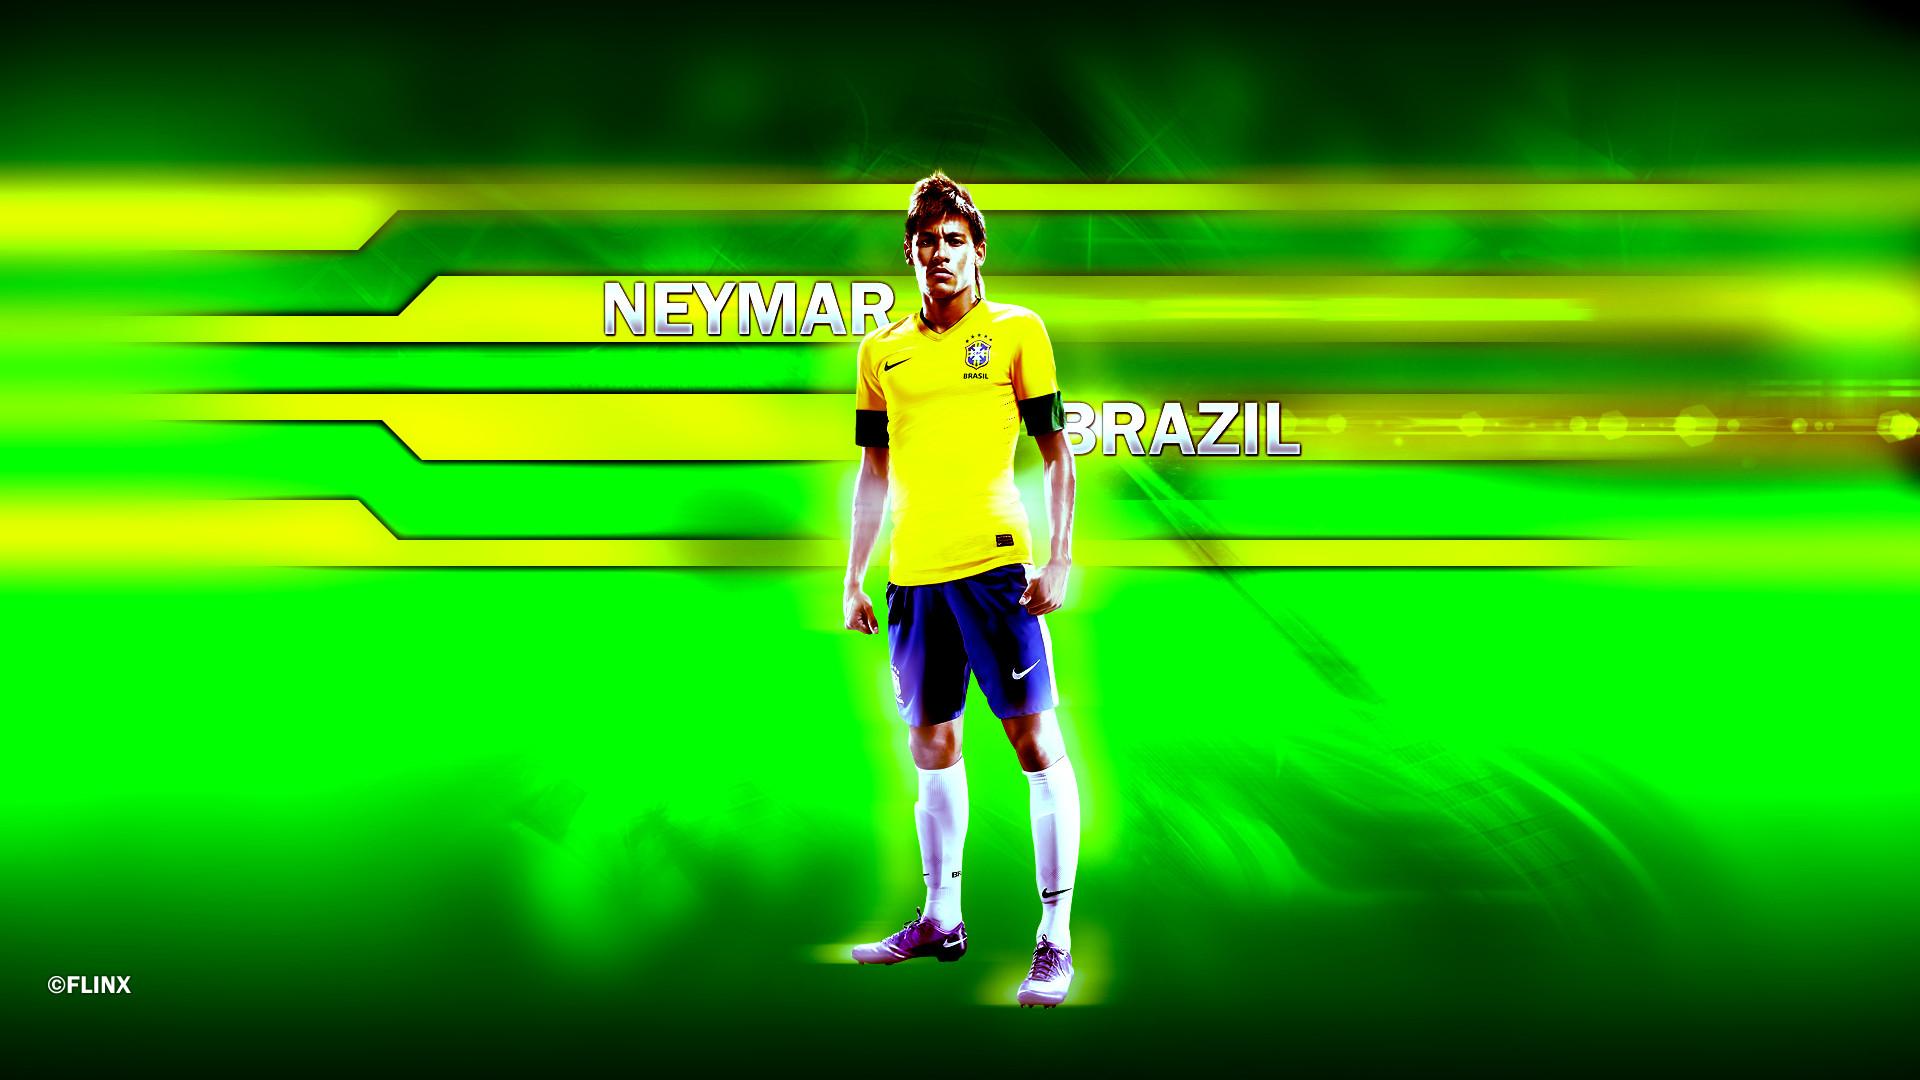 Neymar Jr 2018 Wallpaper (76+ images)